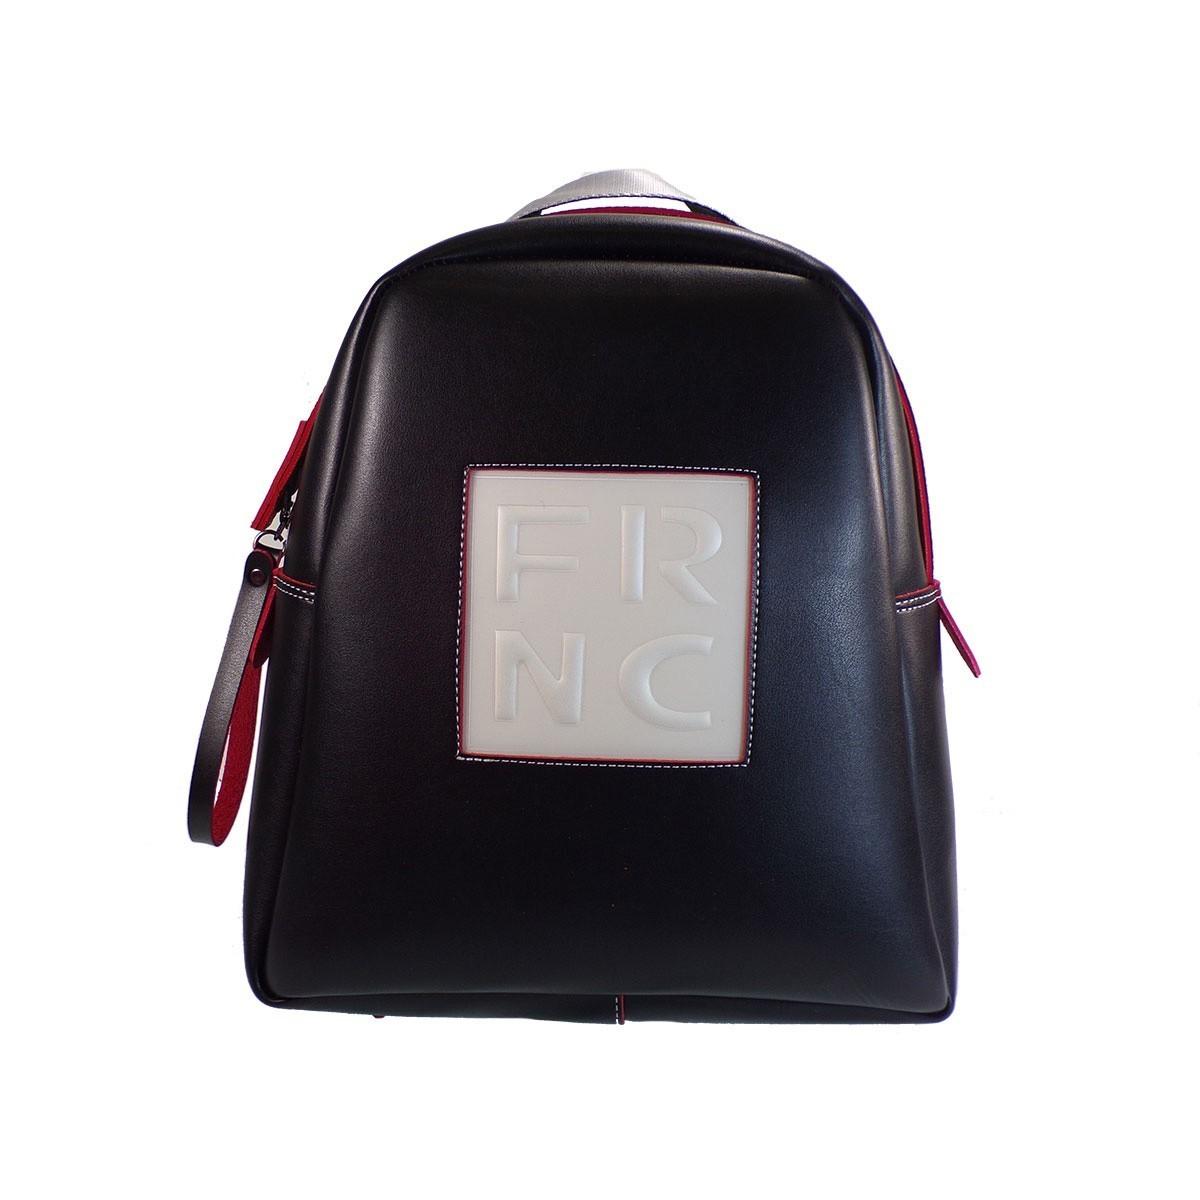 1182f2bc8e FRNC FRANCESCO Τσάντα Γυναικεία Πλάτης-Backpack 1202 Μαύρο Δέρμα ...